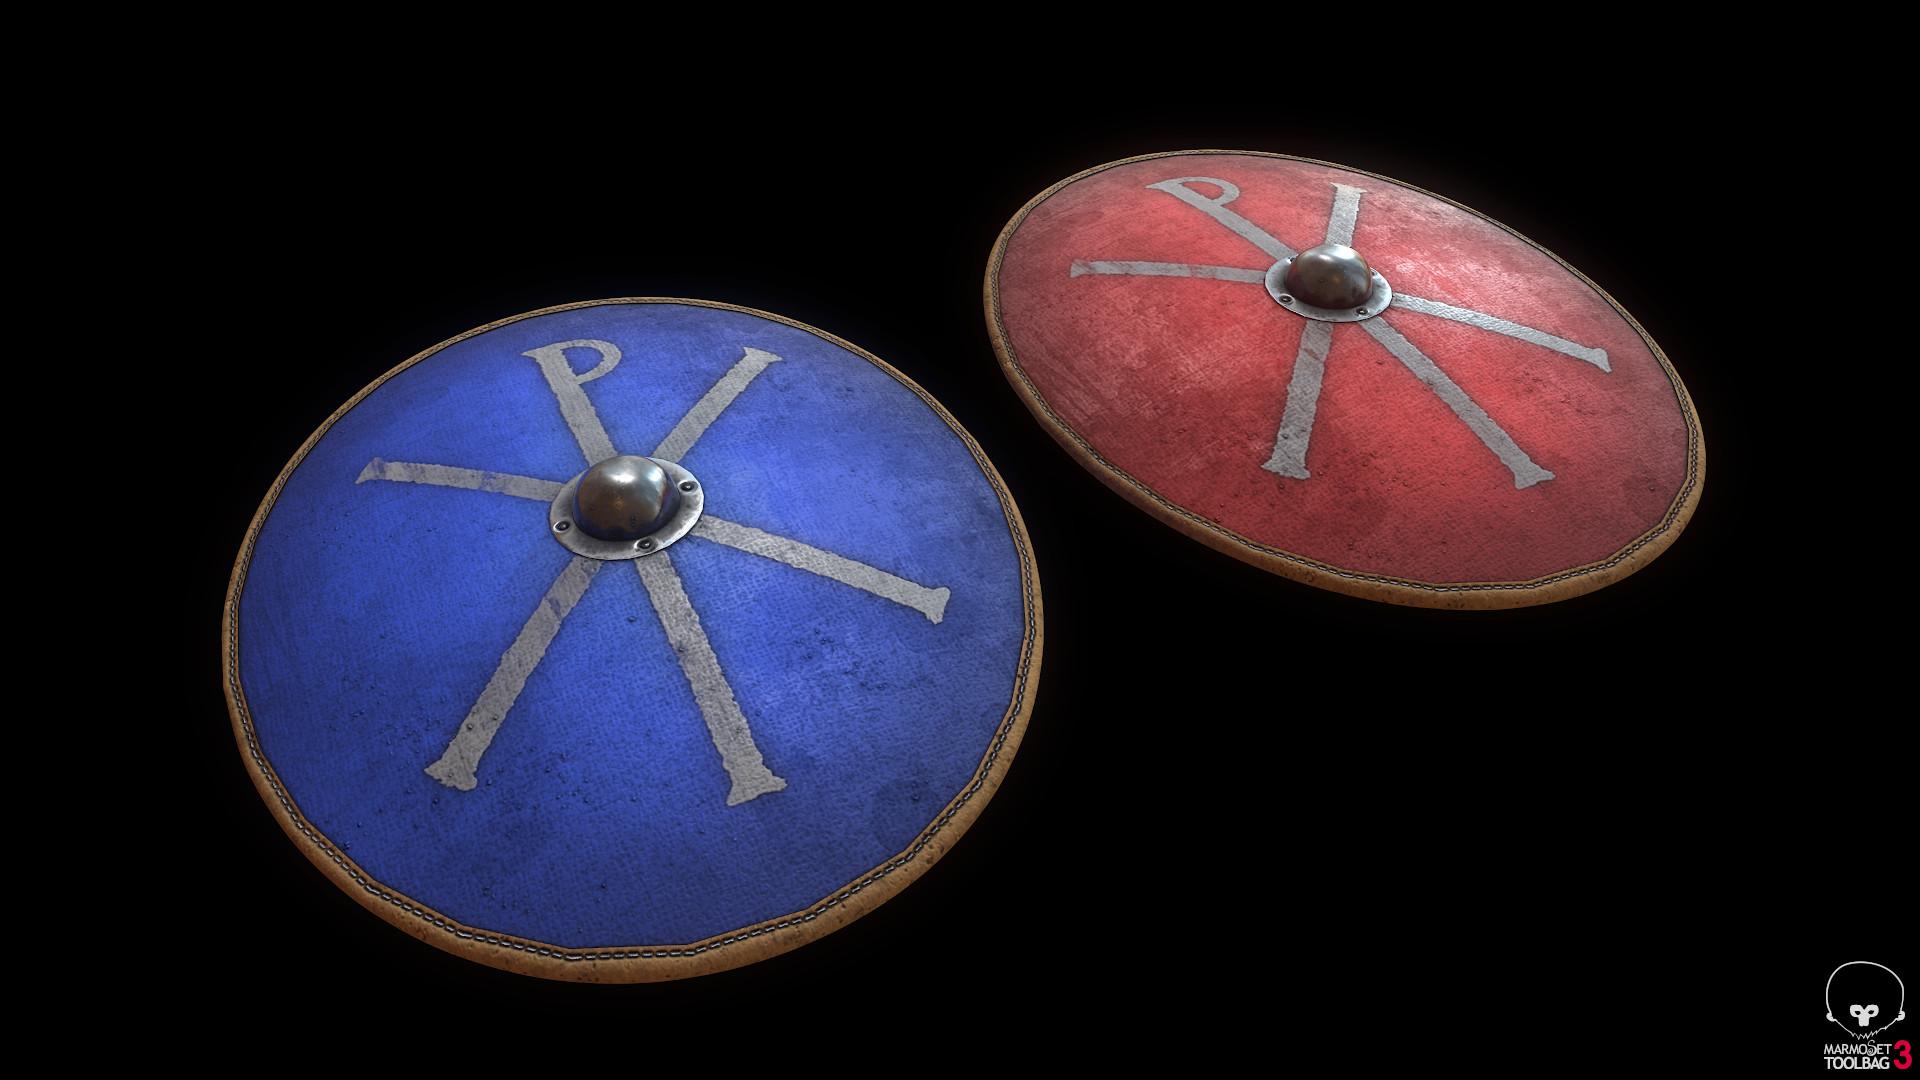 https://cdna.artstation.com/p/assets/images/images/005/042/580/large/bela-csampai-s4h-early-byzantine-shield-01-preview-mt-02.jpg?1488088221